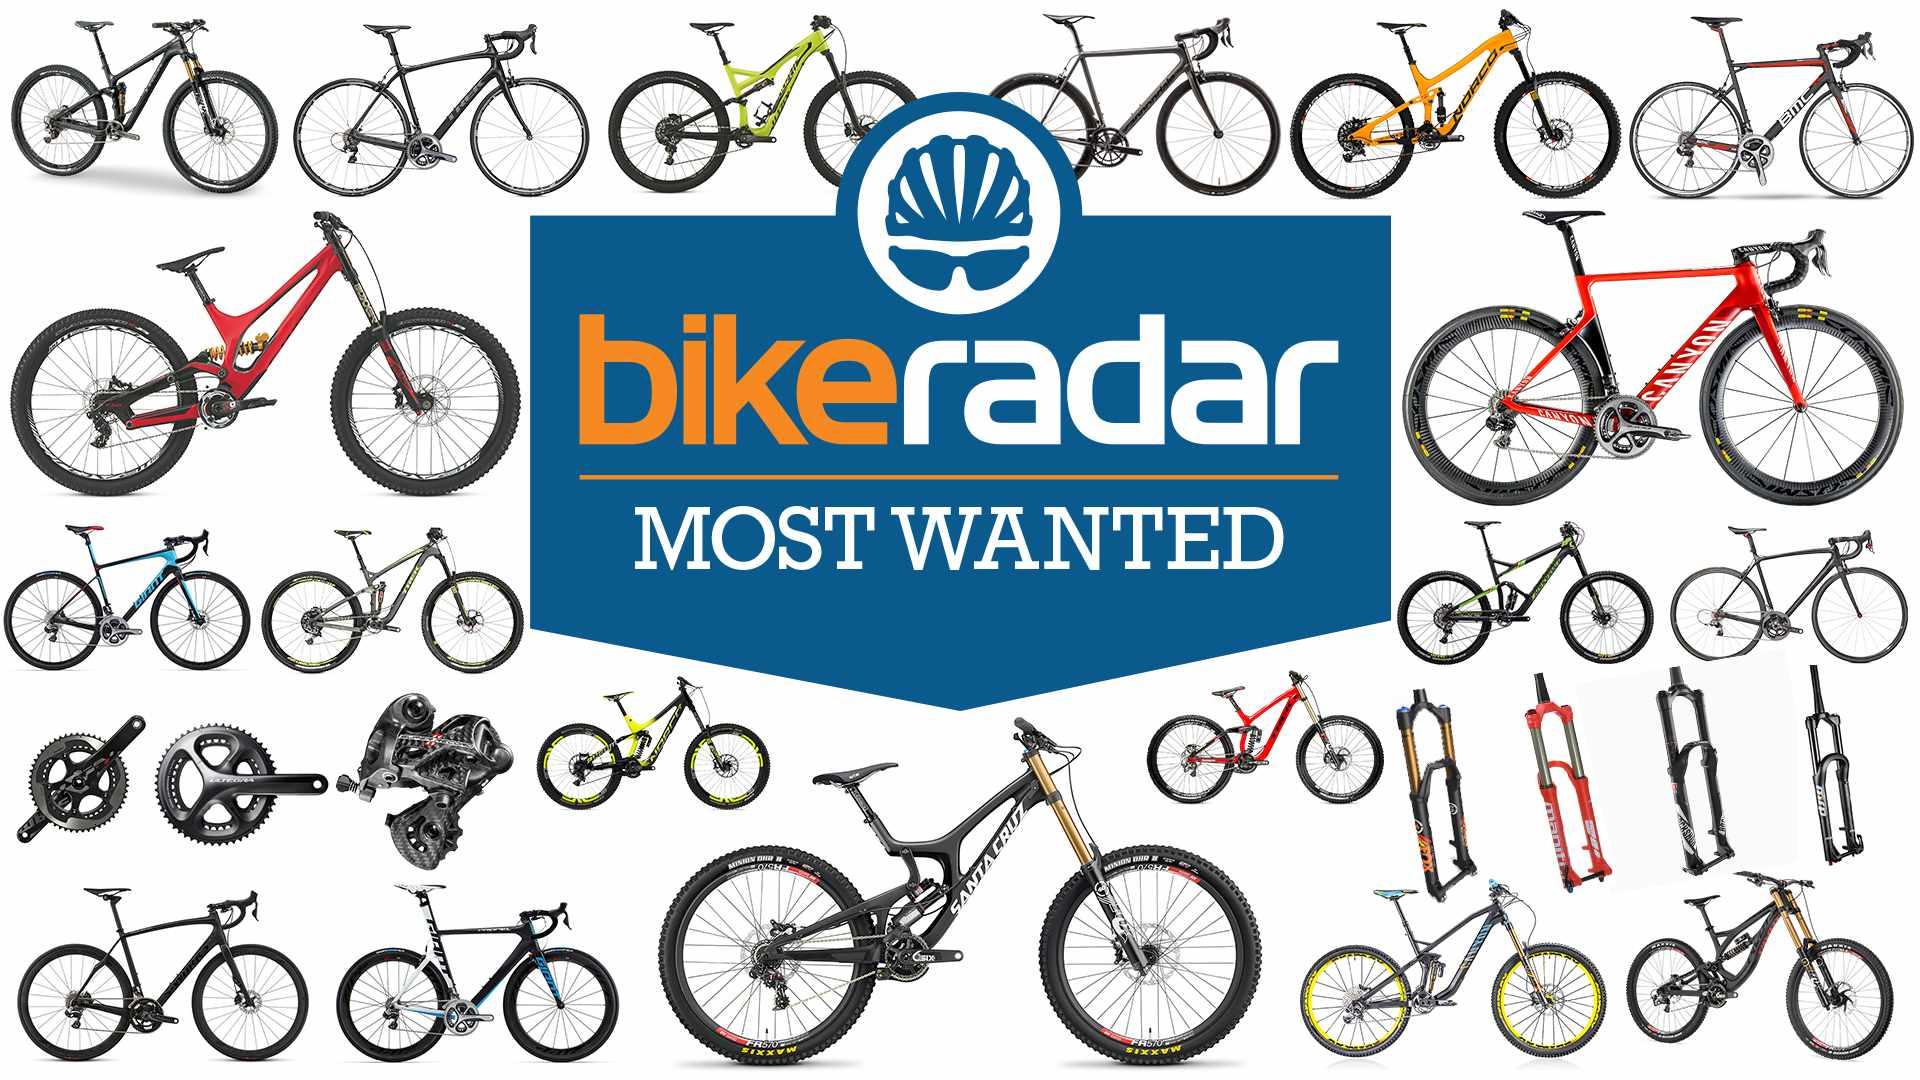 BikeRadar's 2015 Most Wanted Awards